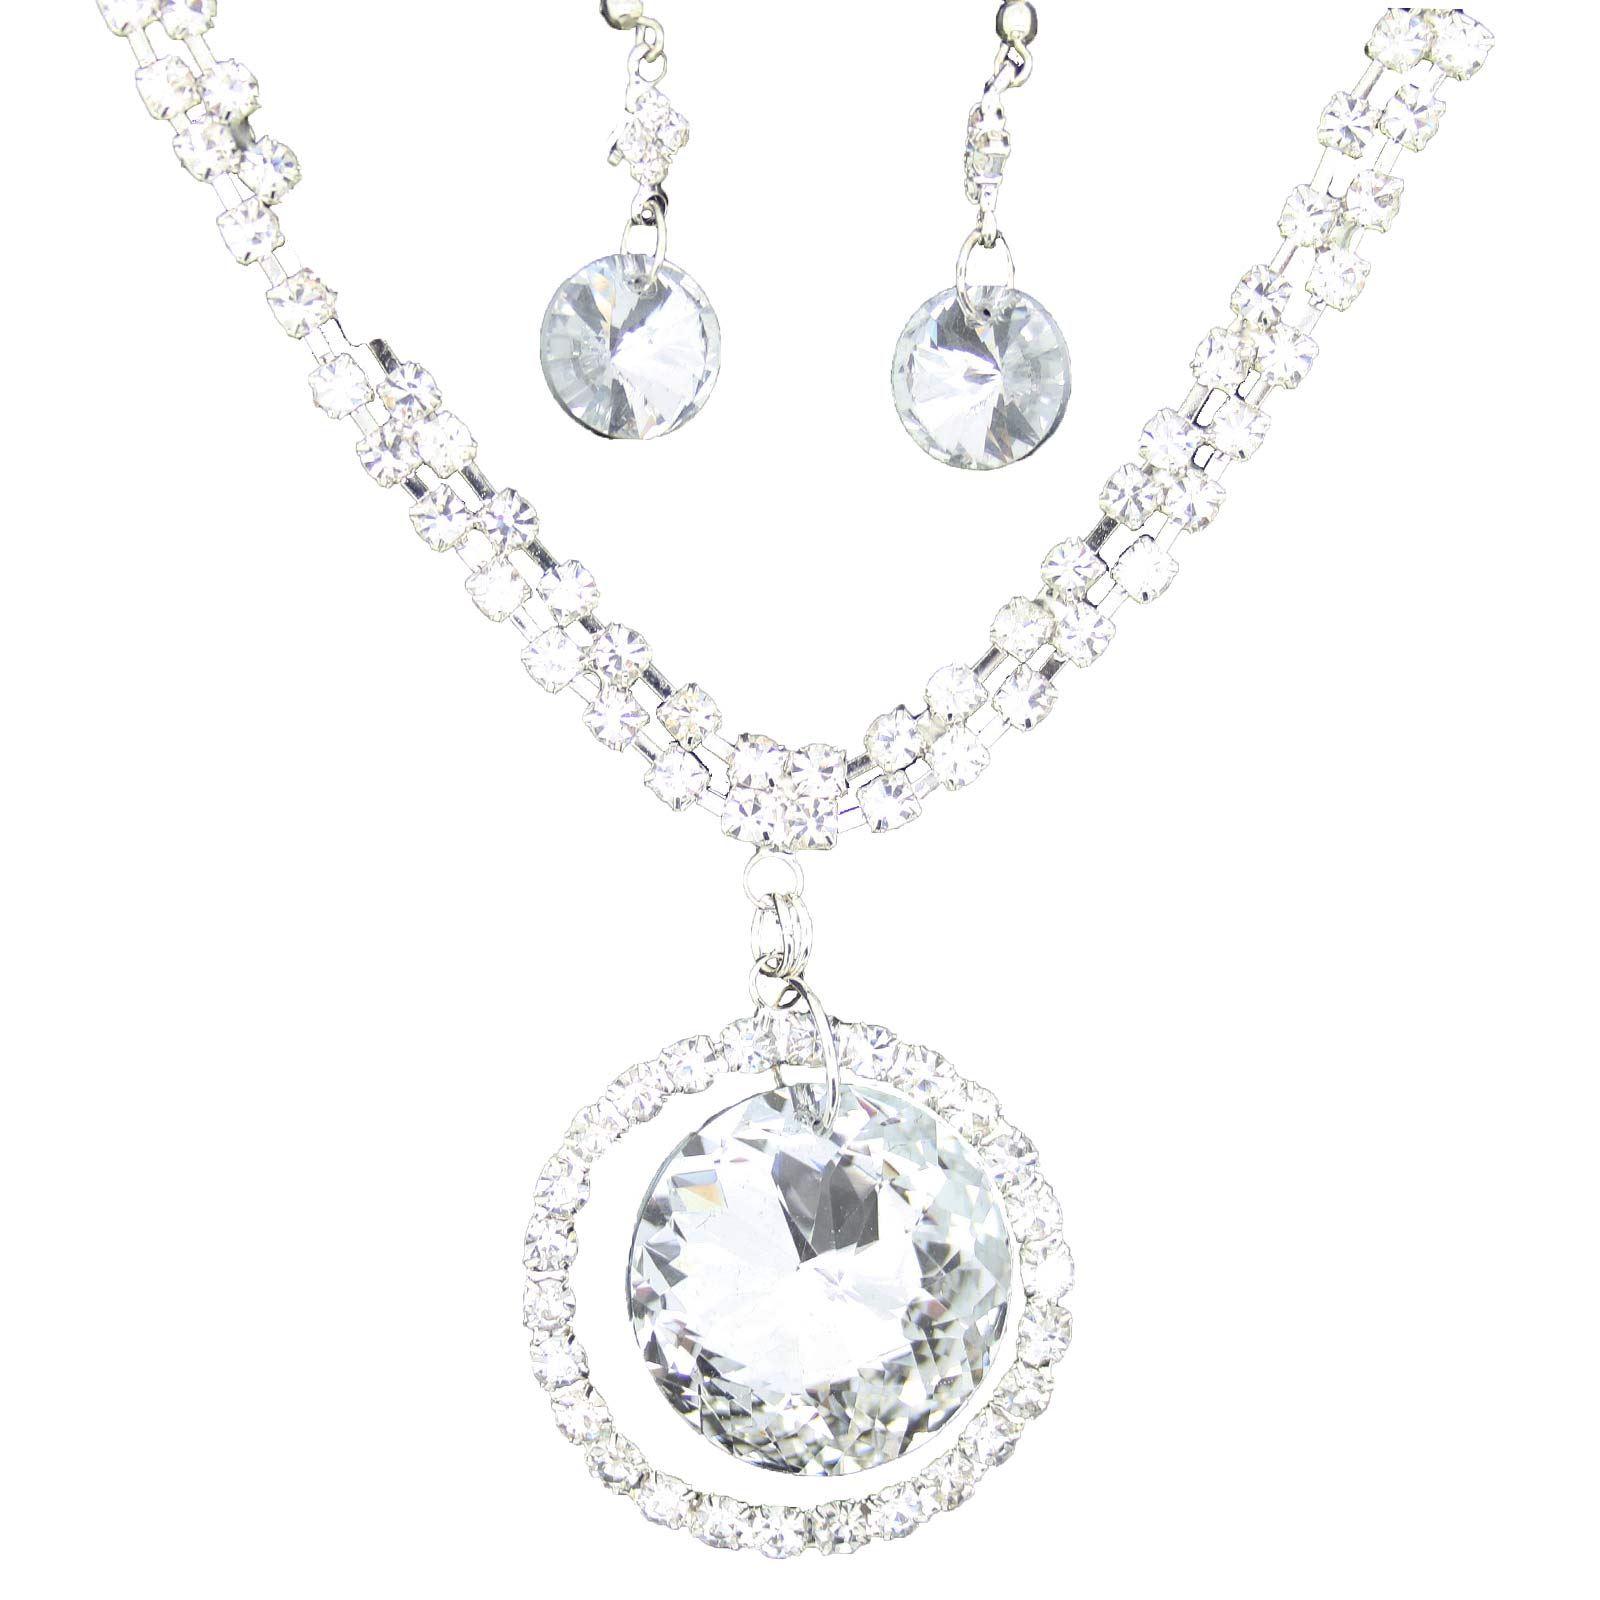 True-Face-Ladies-Women-039-s-Elegant-Earrings-Necklace-Set-Metal-Alloy-Jewellery thumbnail 36